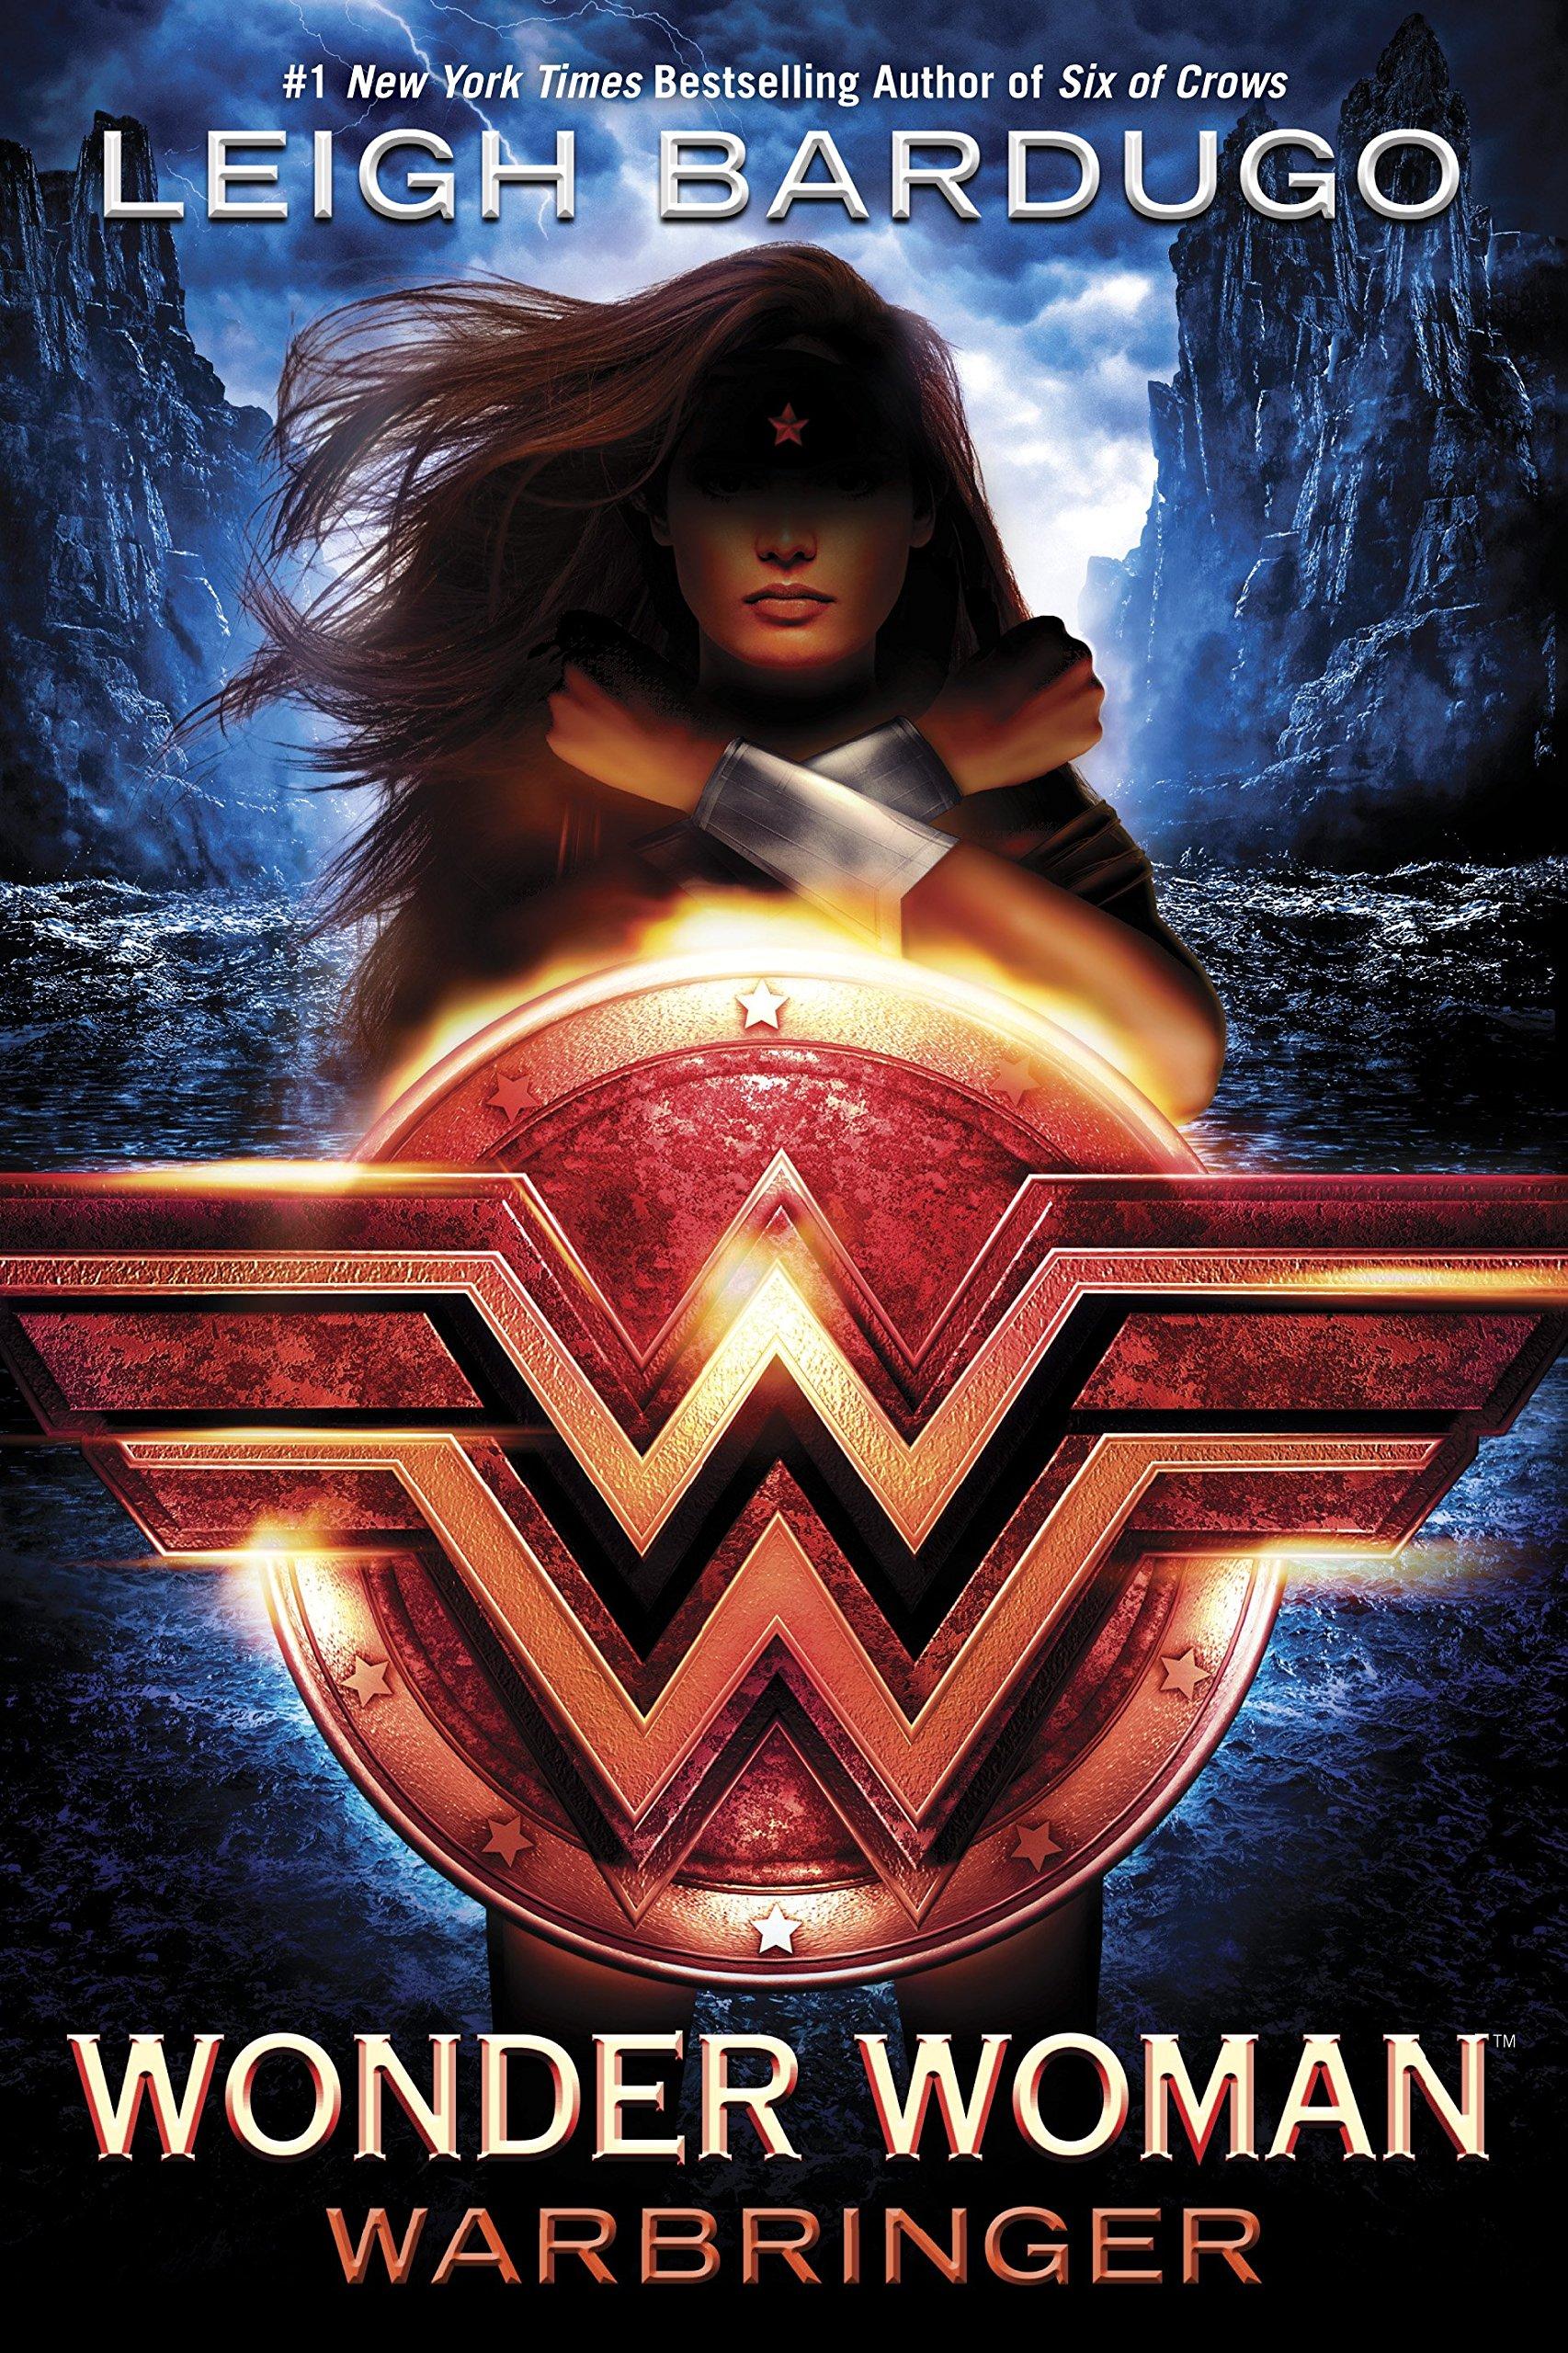 Wonder Woman: Warbringer - Leigh Bardugo | Author